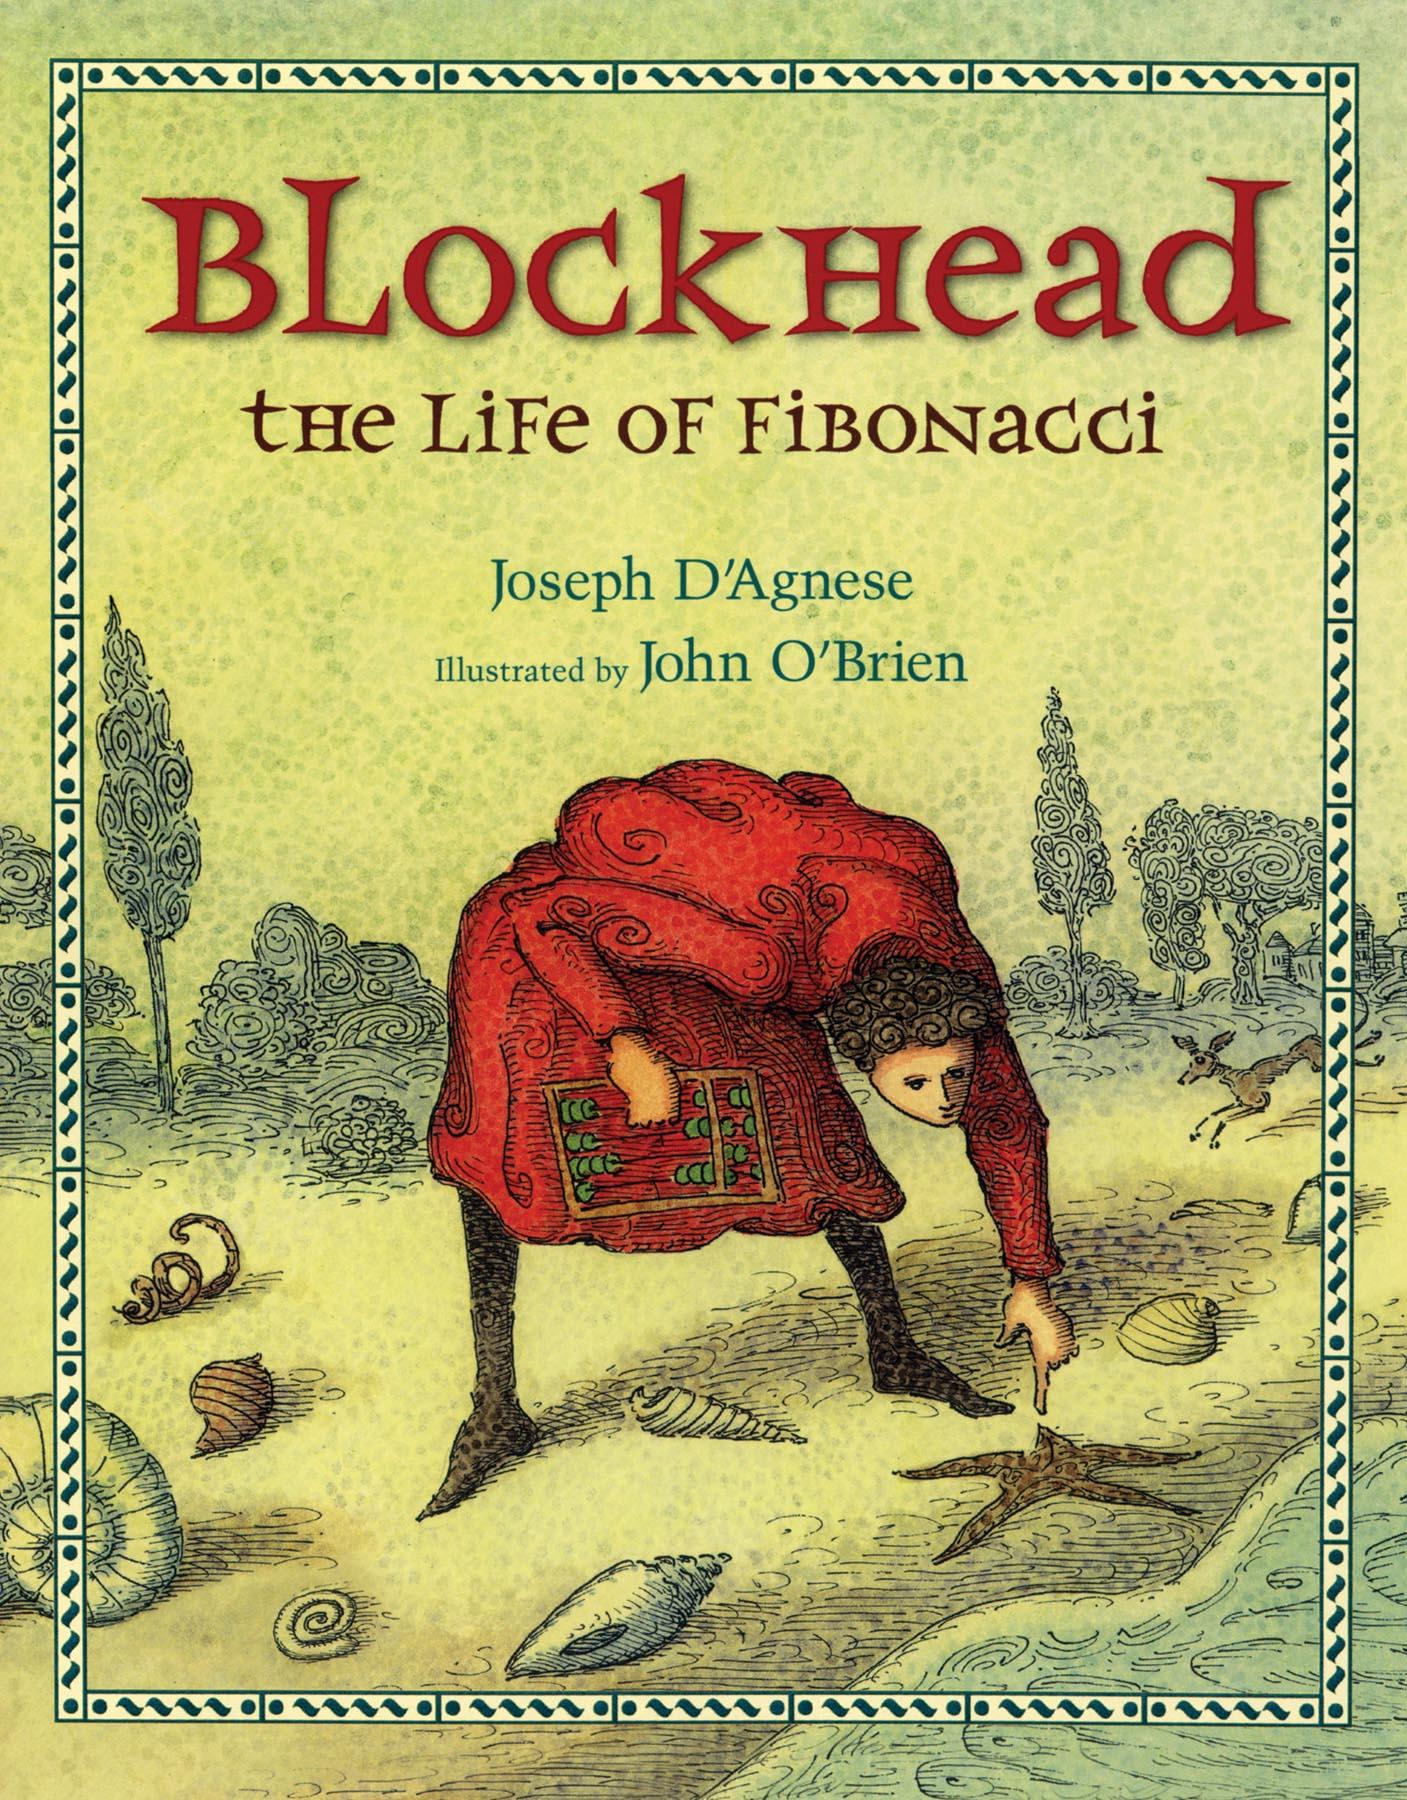 Blockhead The Life of Fibonacci by Joseph D'Agnese illustrated by John O'Brien